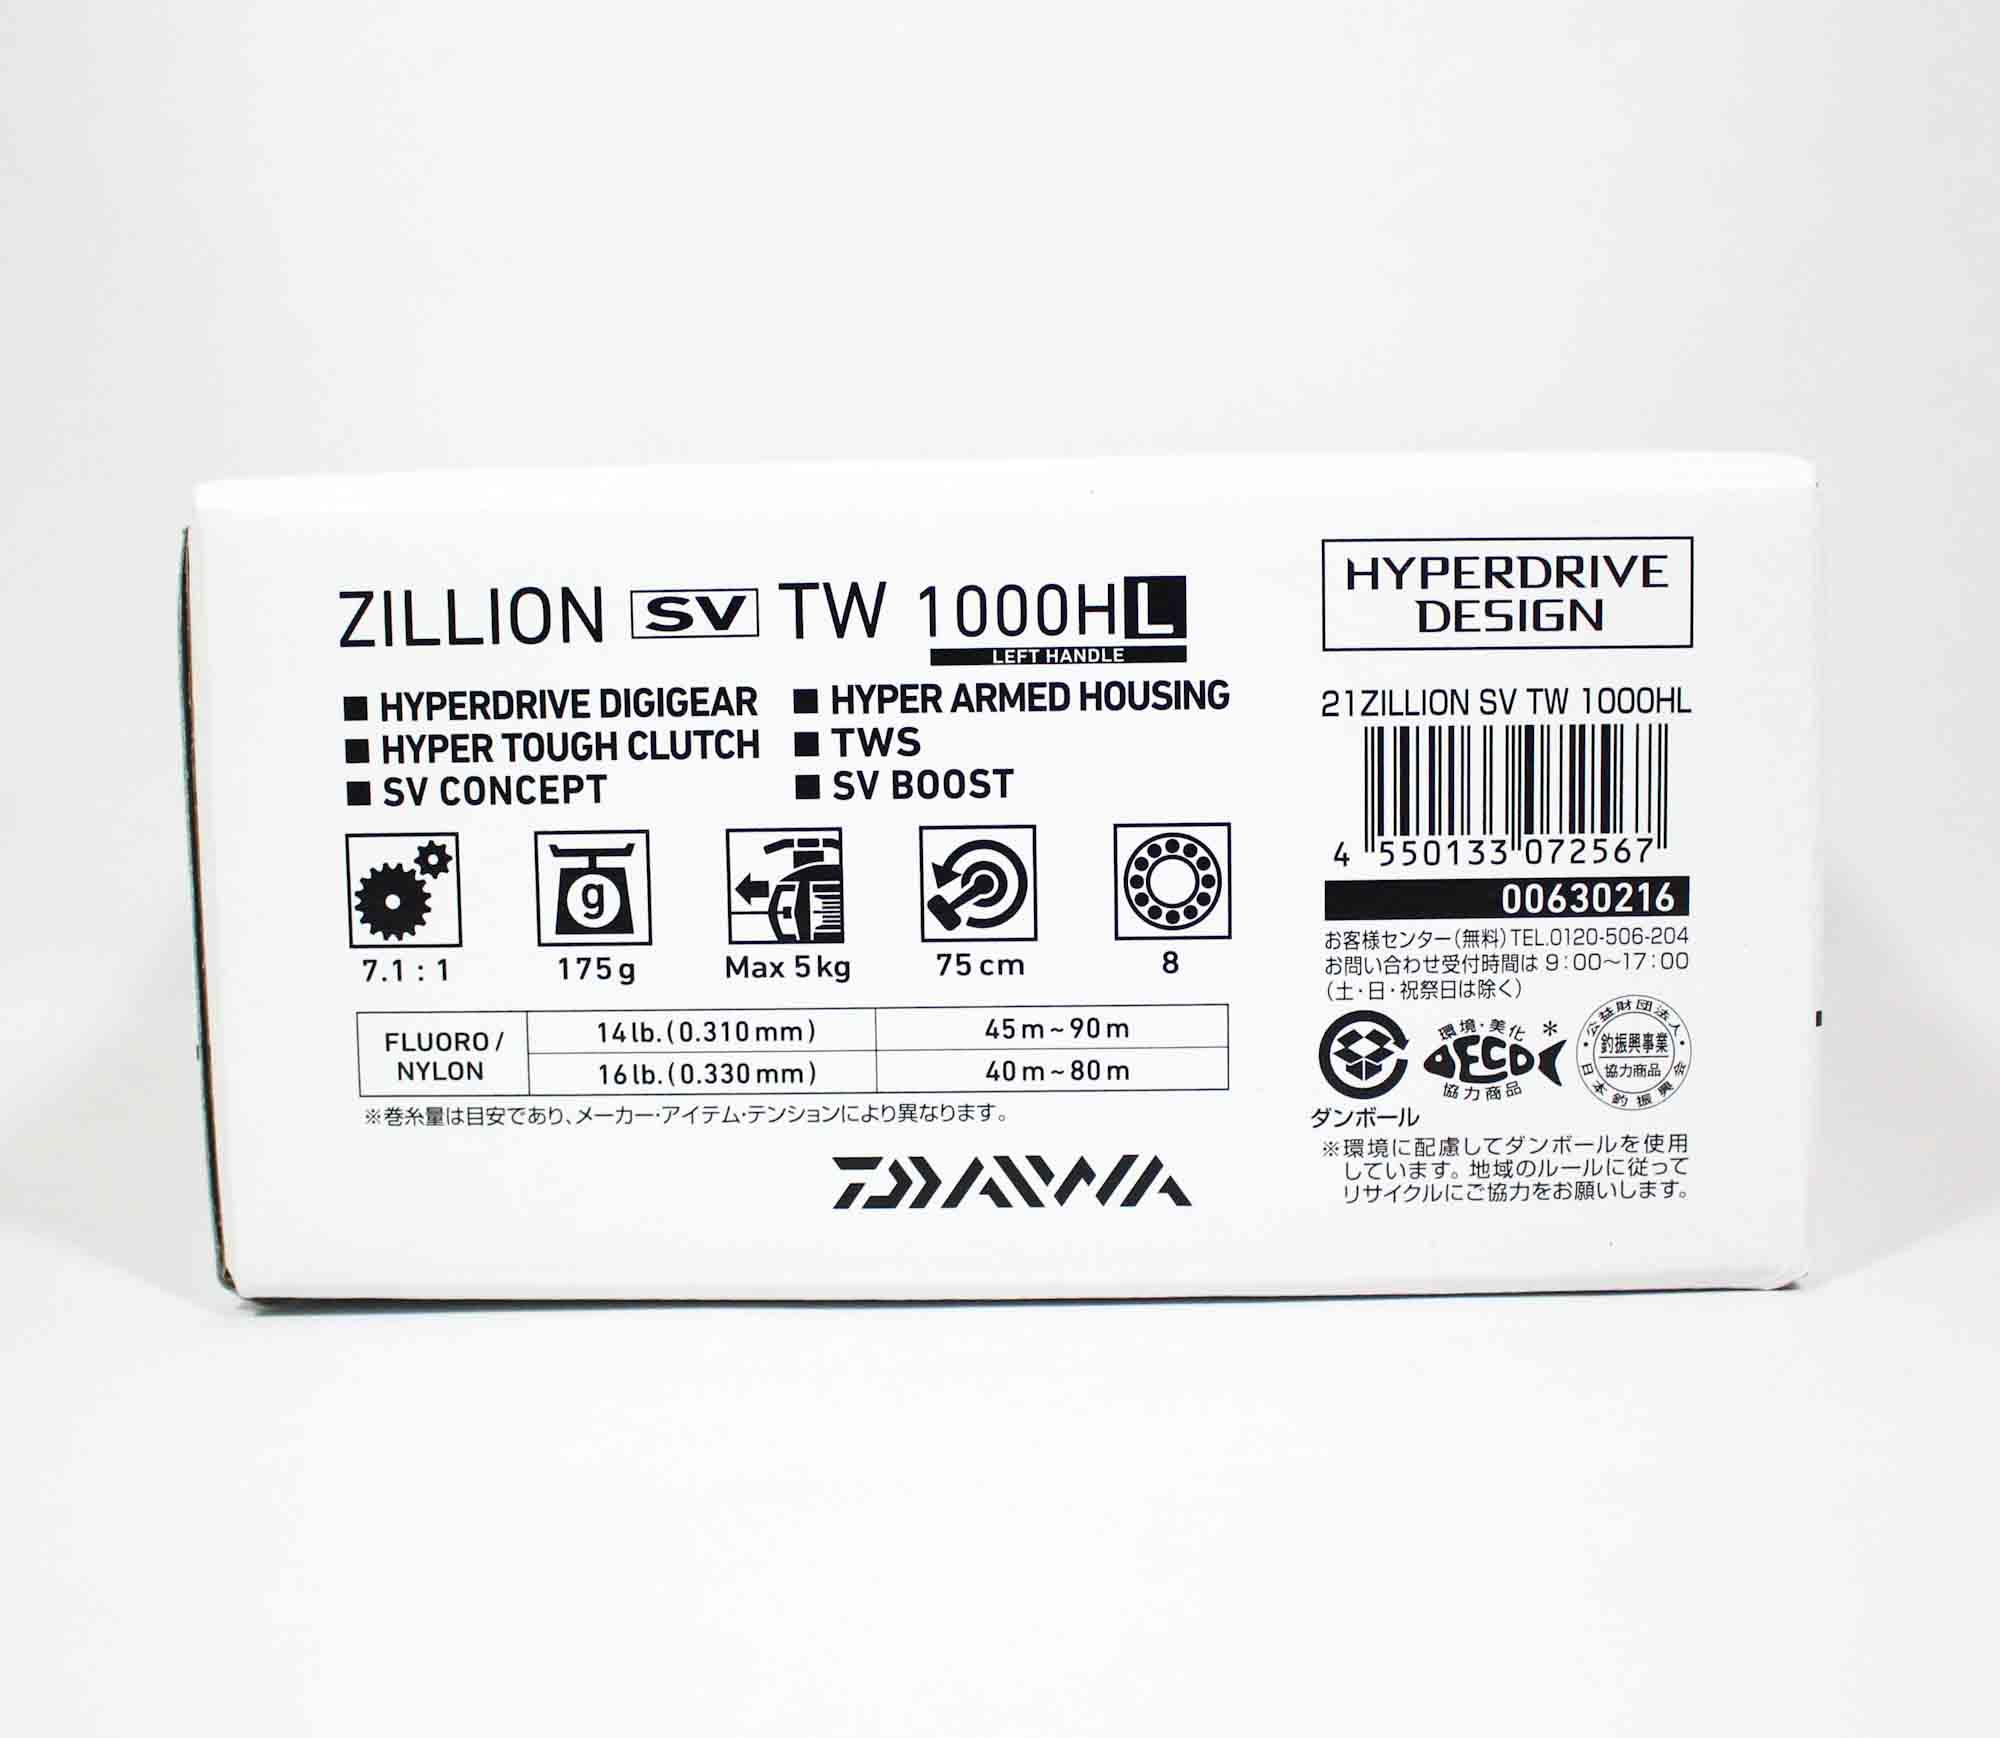 Daiwa Reel Baitcast 21 Zillion SV TW 1000 HL Left Hand (2567)